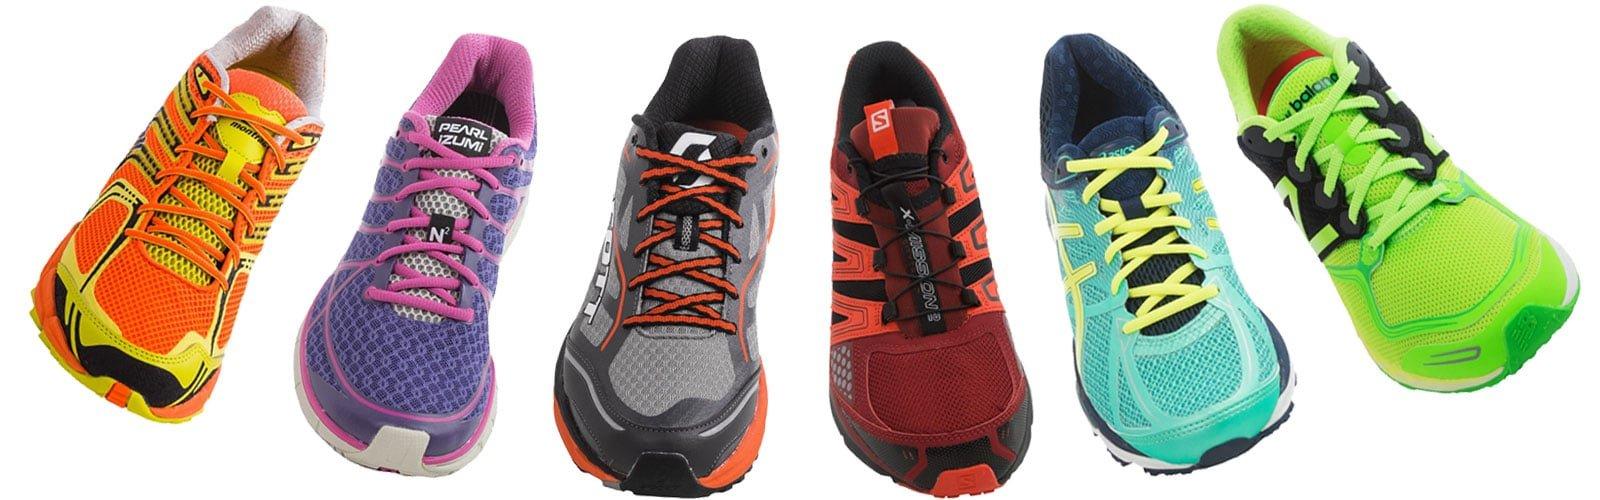 Best Pronation Running Shoes